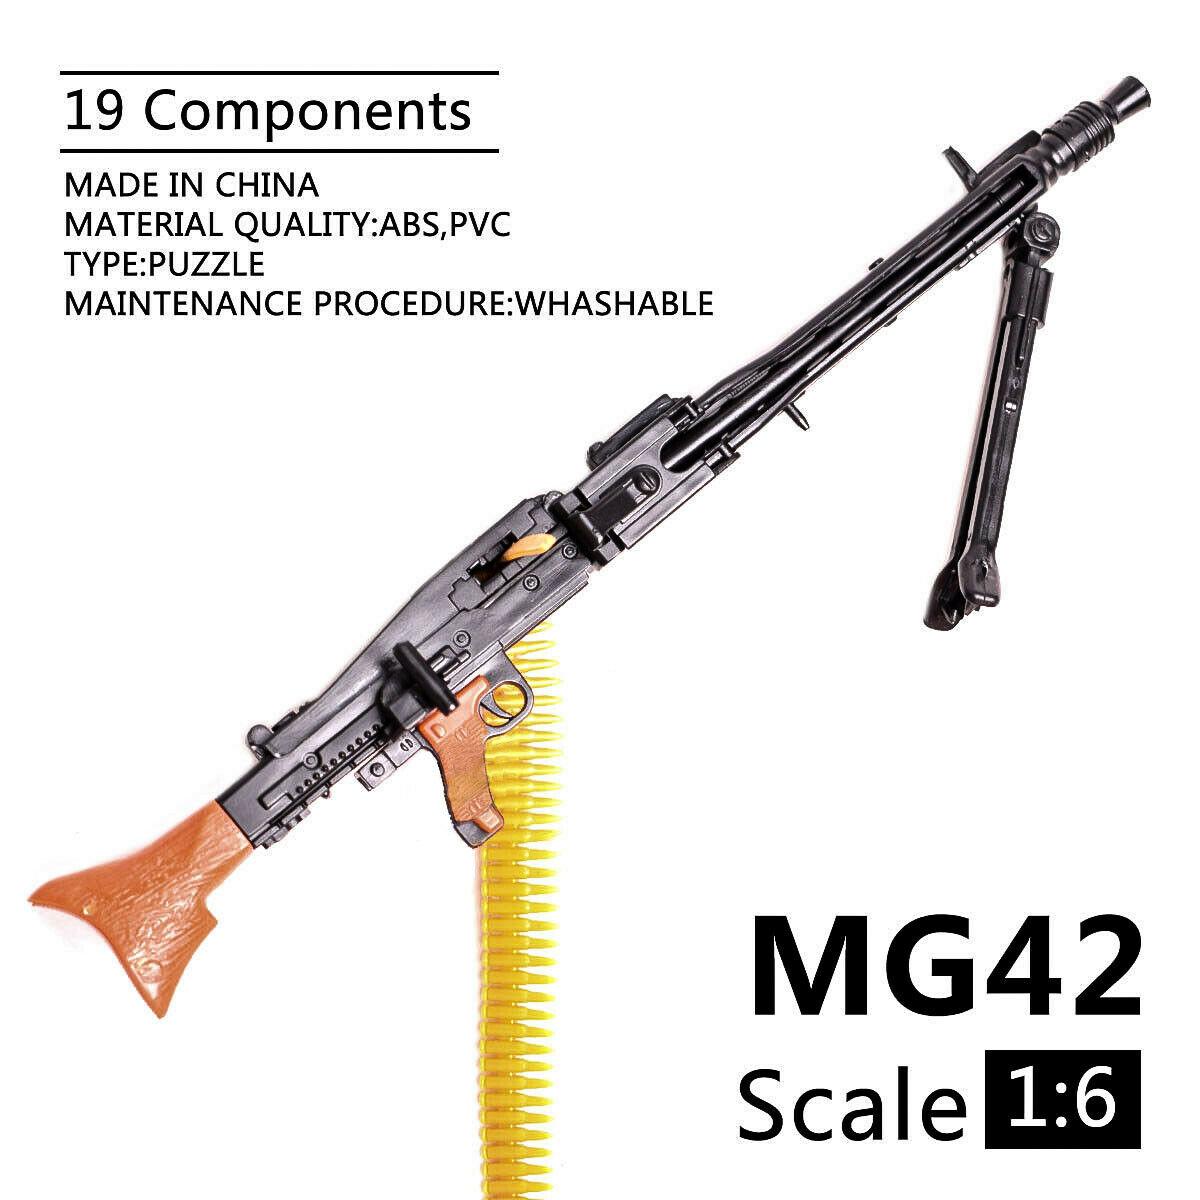 1/6 Scale MG42 Toy Gun Model Assembly Puzzles Building Bricks Gun Soldier Machine Gun Fit 12